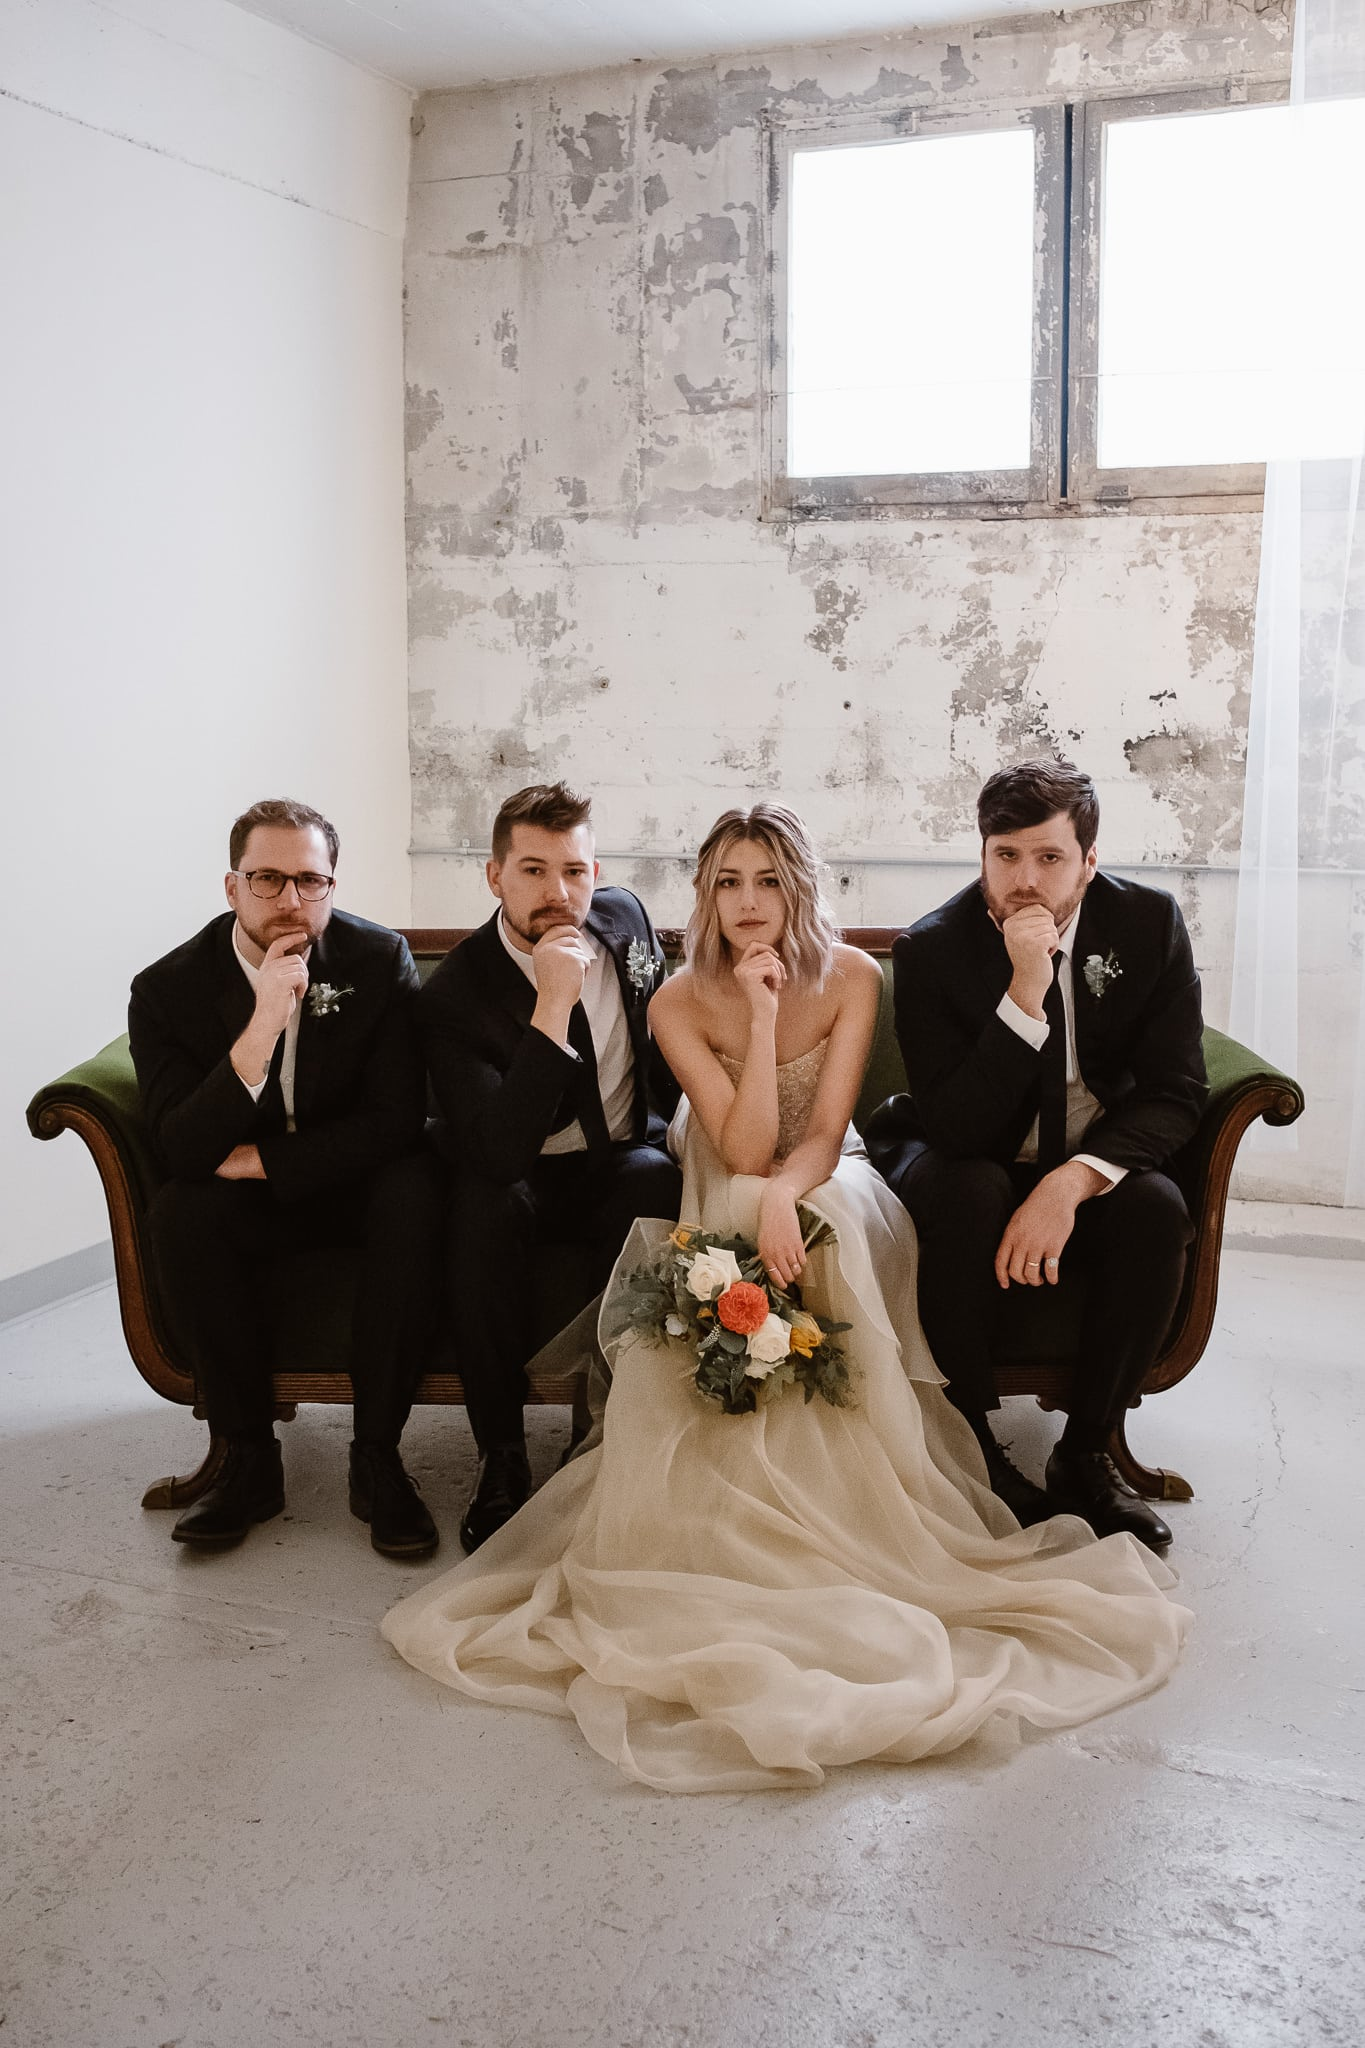 St Vrain Wedding Photographer | Longmont Wedding Photographer | Colorado Winter Wedding Photographer, Colorado industrial chic wedding, bride and groom with wedding party, Wildermiss band photo